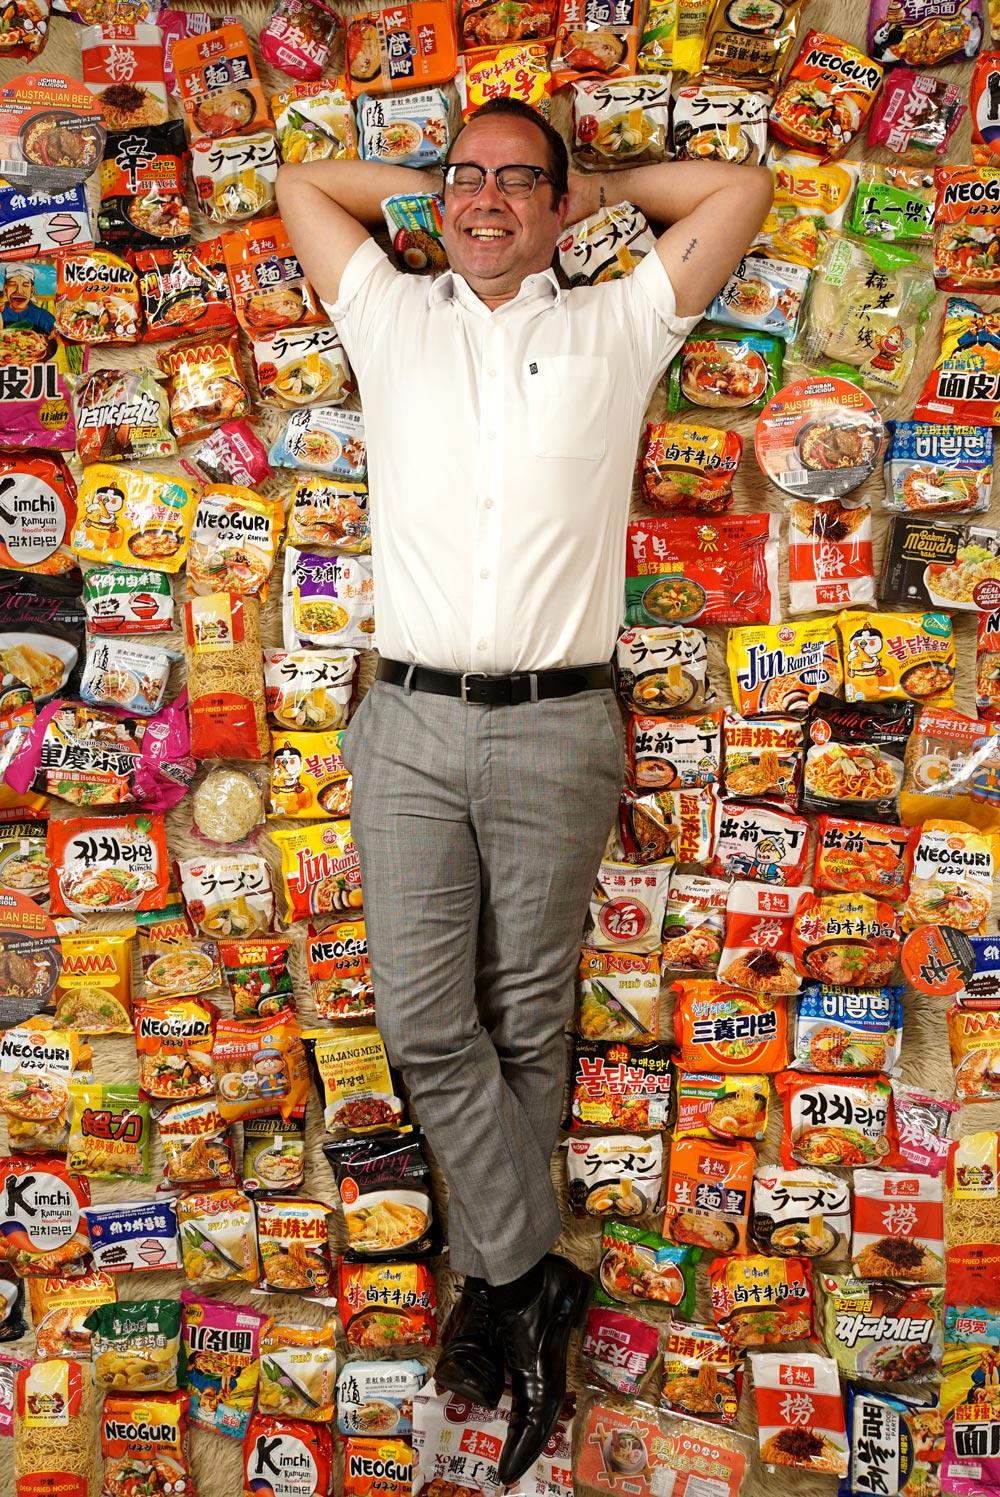 Rug-of-Noodles.jpg